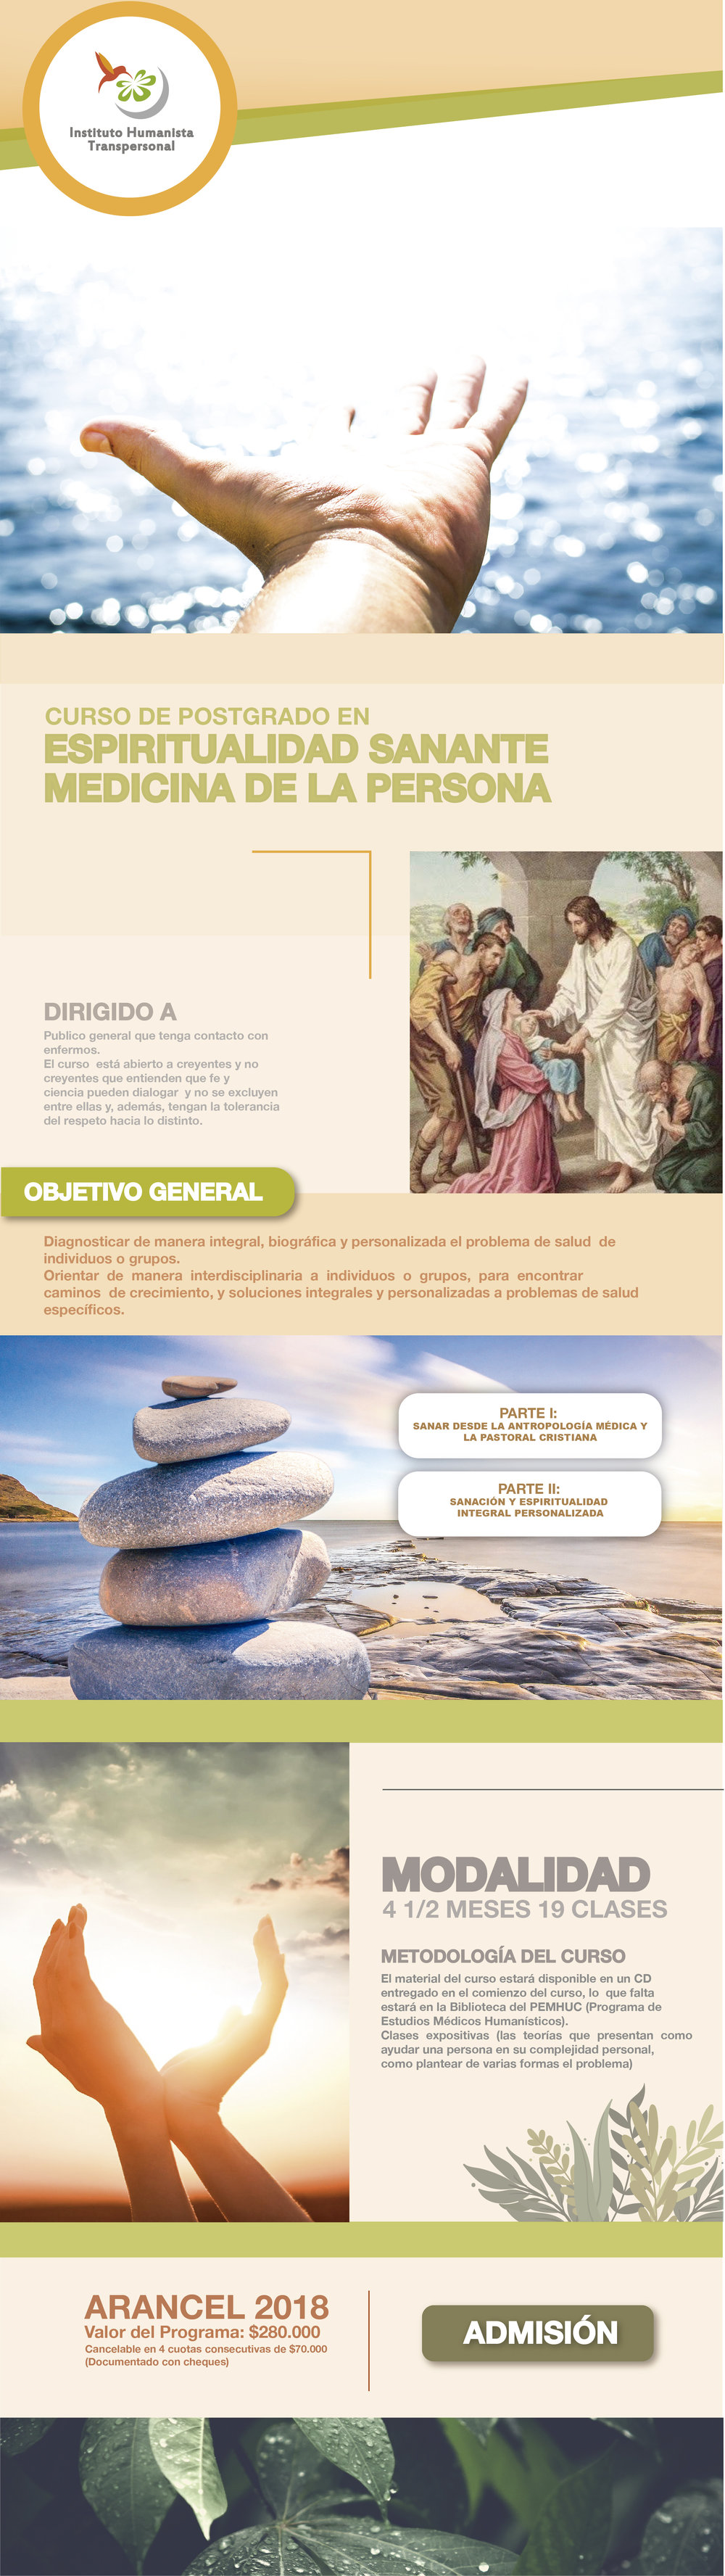 espiritualidad sanante-01.jpg